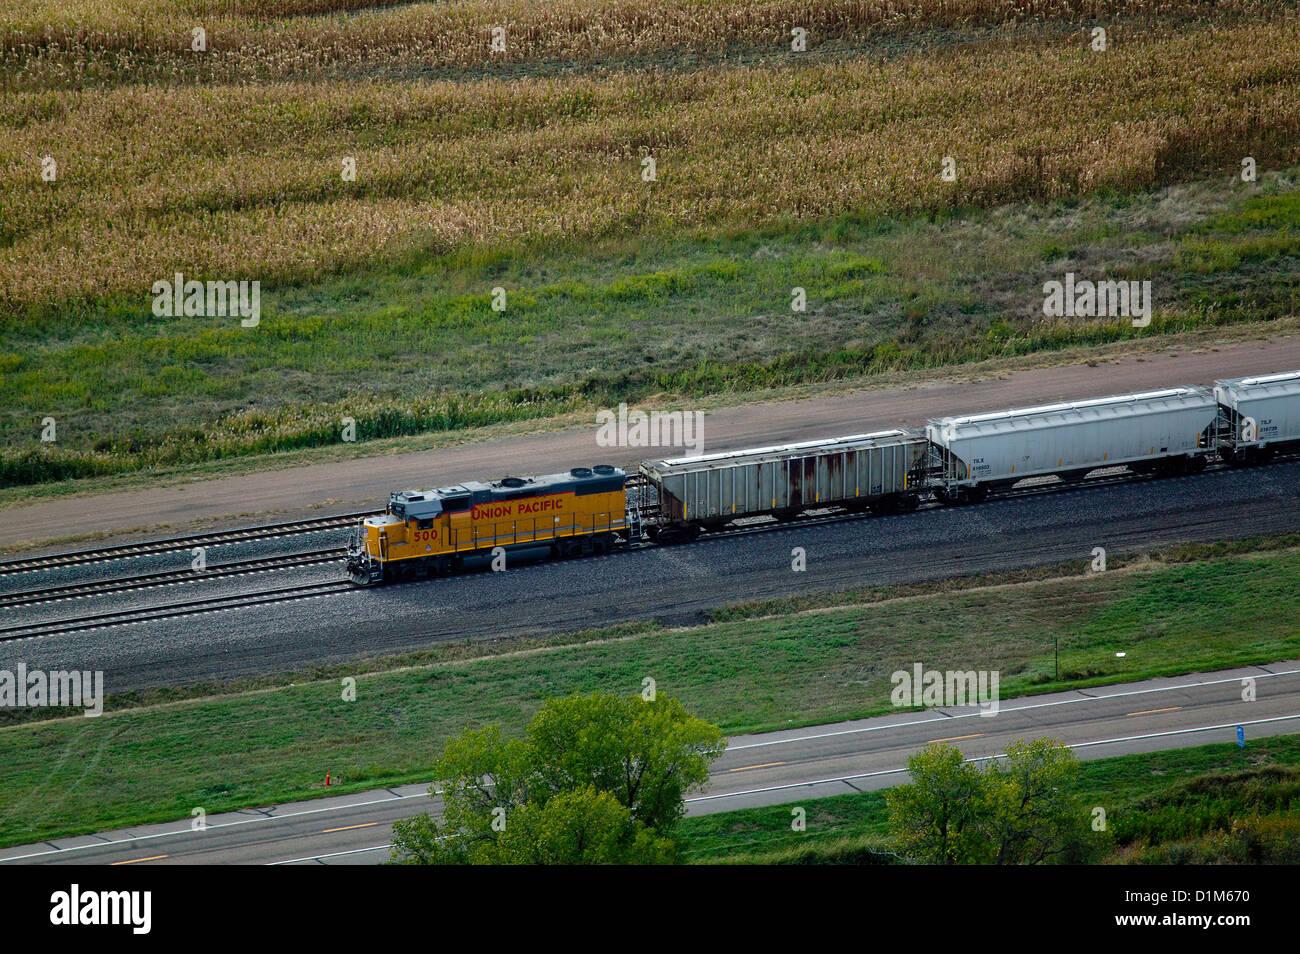 Fotografía aérea Union Pacific locomotora autos Nebraska Imagen De Stock